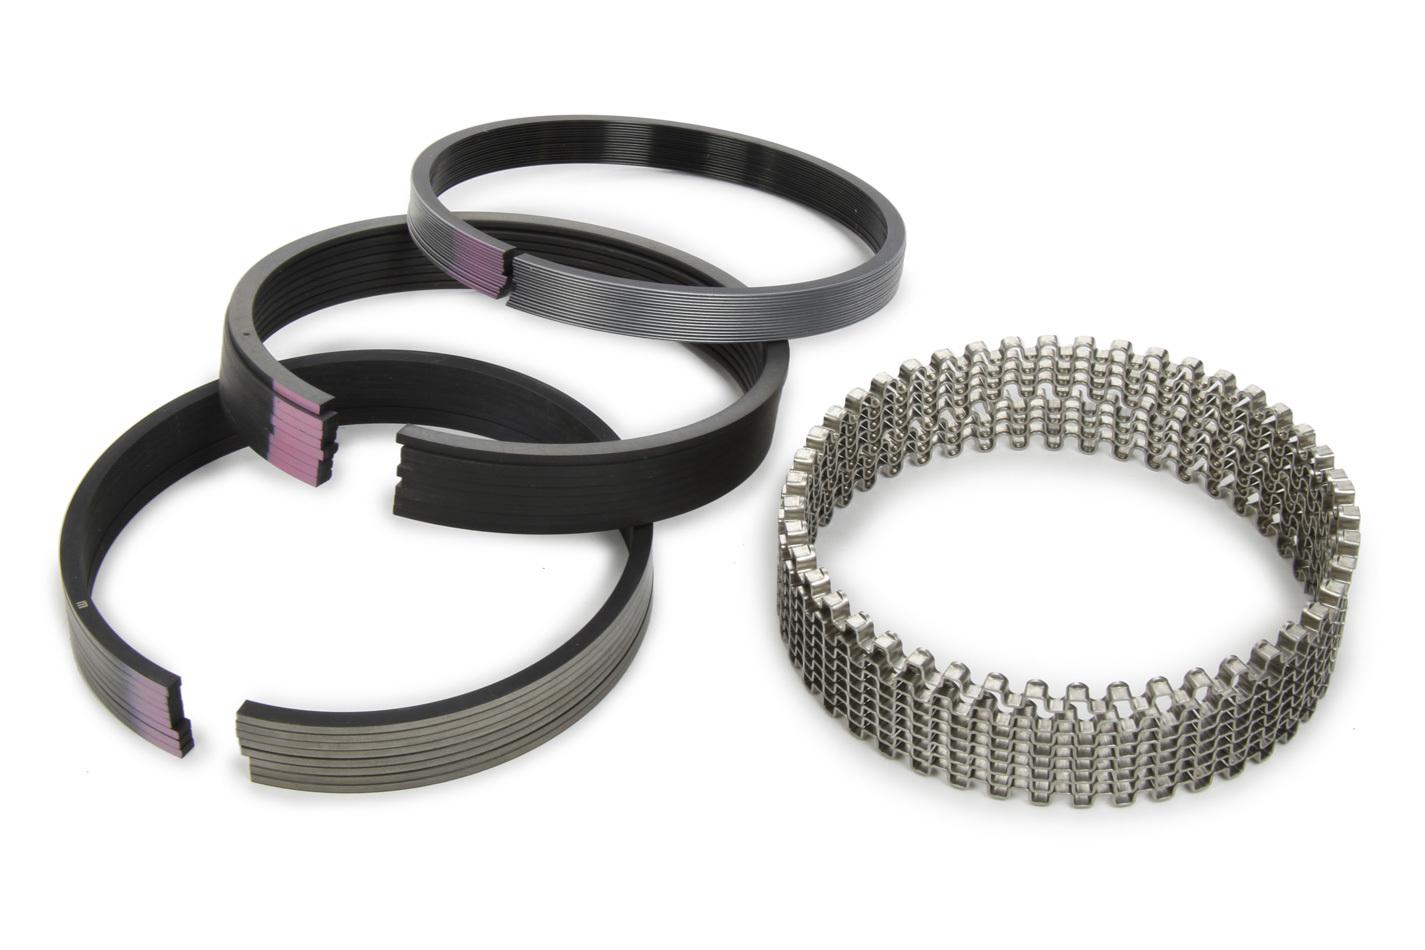 Piston Ring Set 4.060 Moly 5/64 5/64 3/16